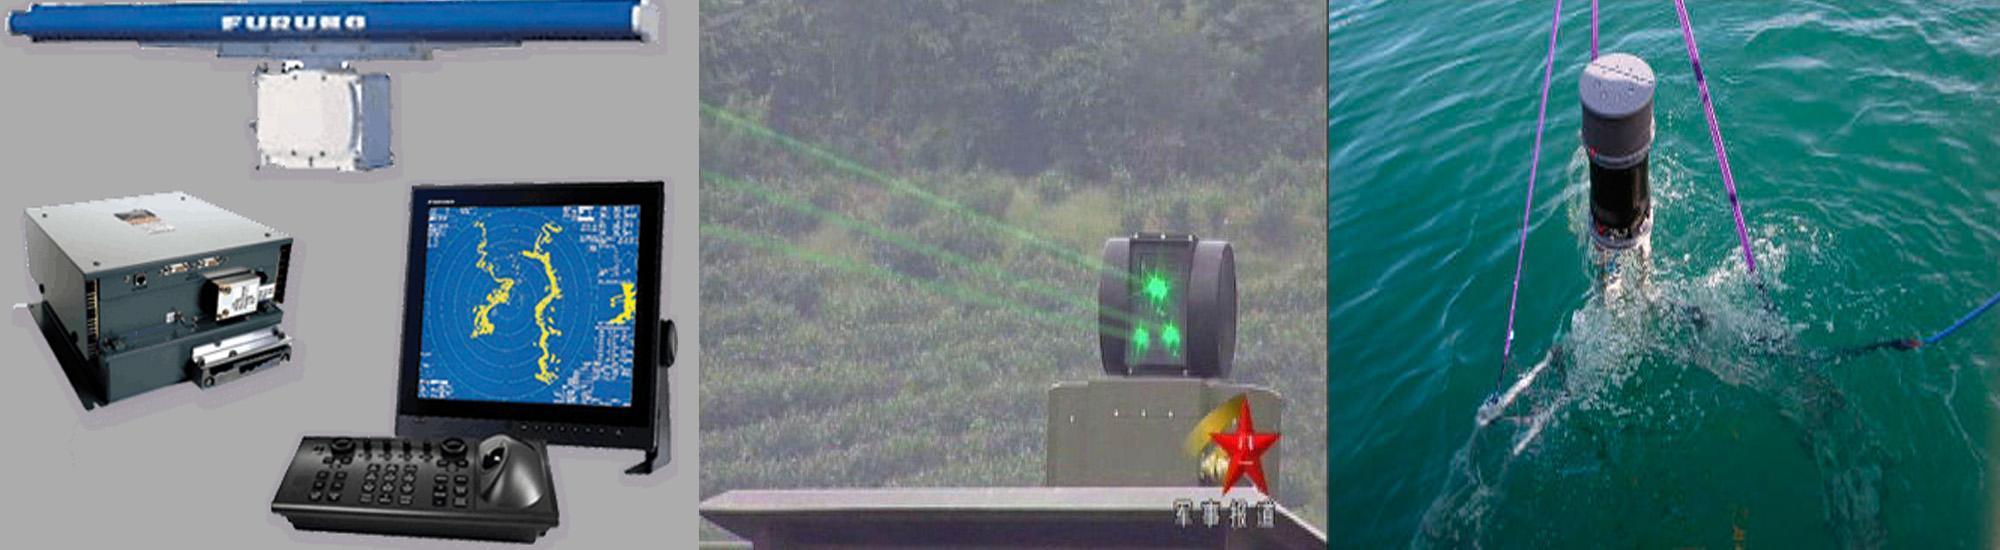 Radar Sonar and Lazer Detection Systems